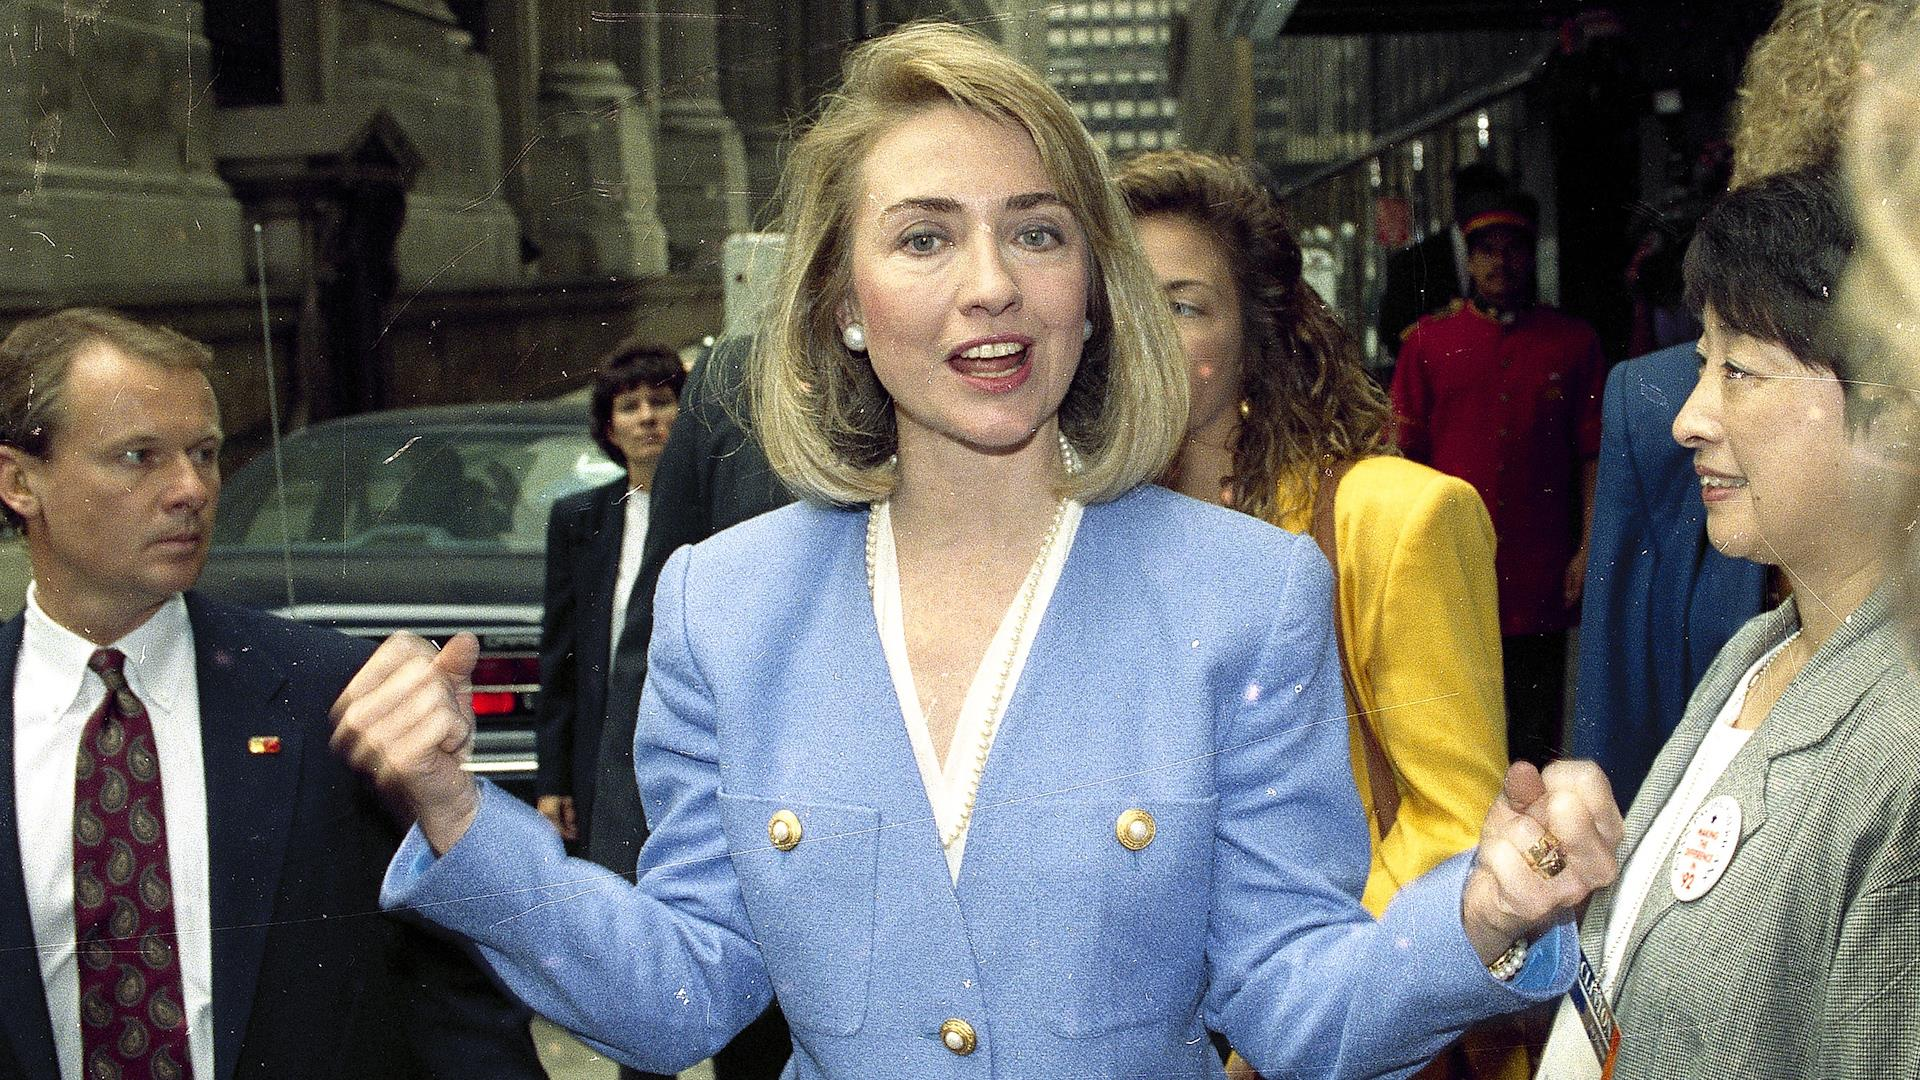 Flashback: Hillary Clinton as First Lady